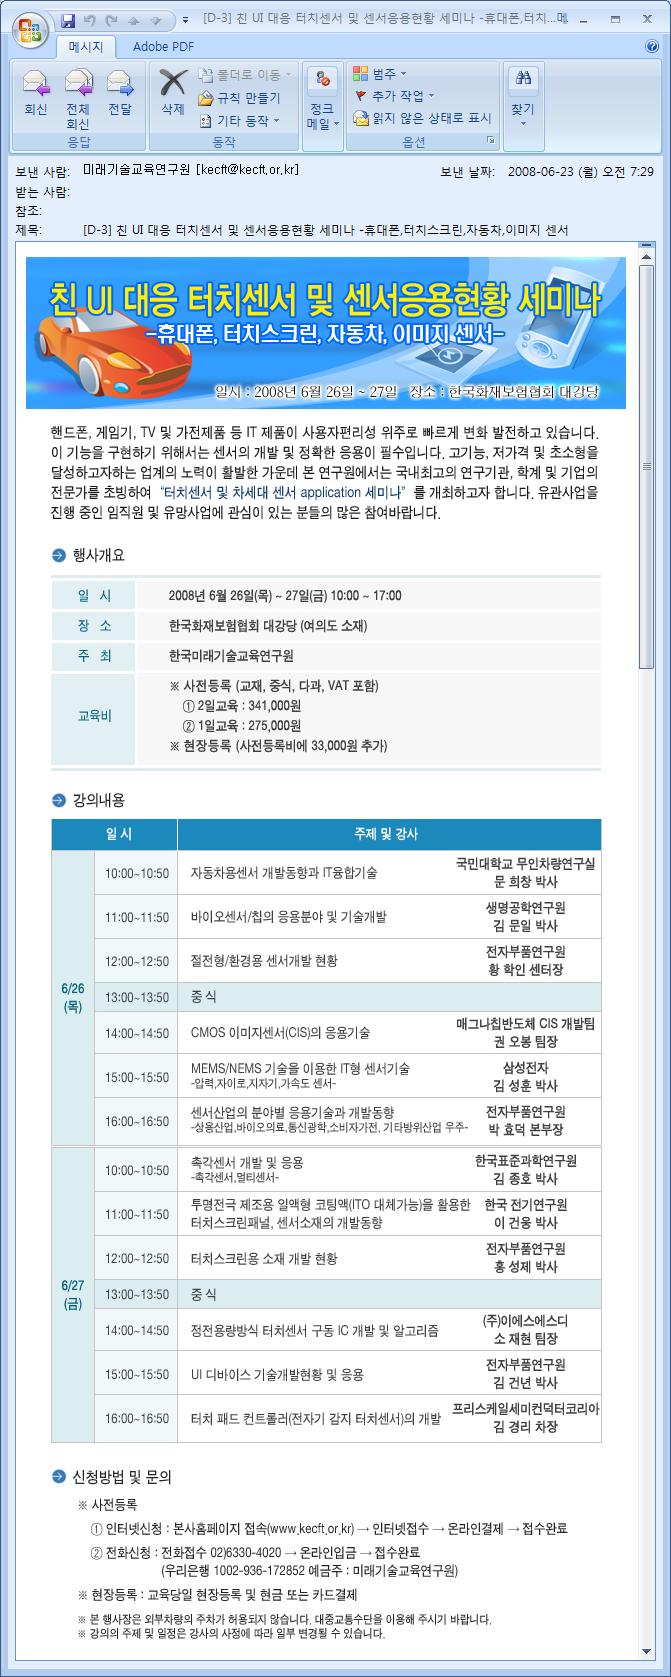 Curriculum for UI-Friendly Sensor Seminars